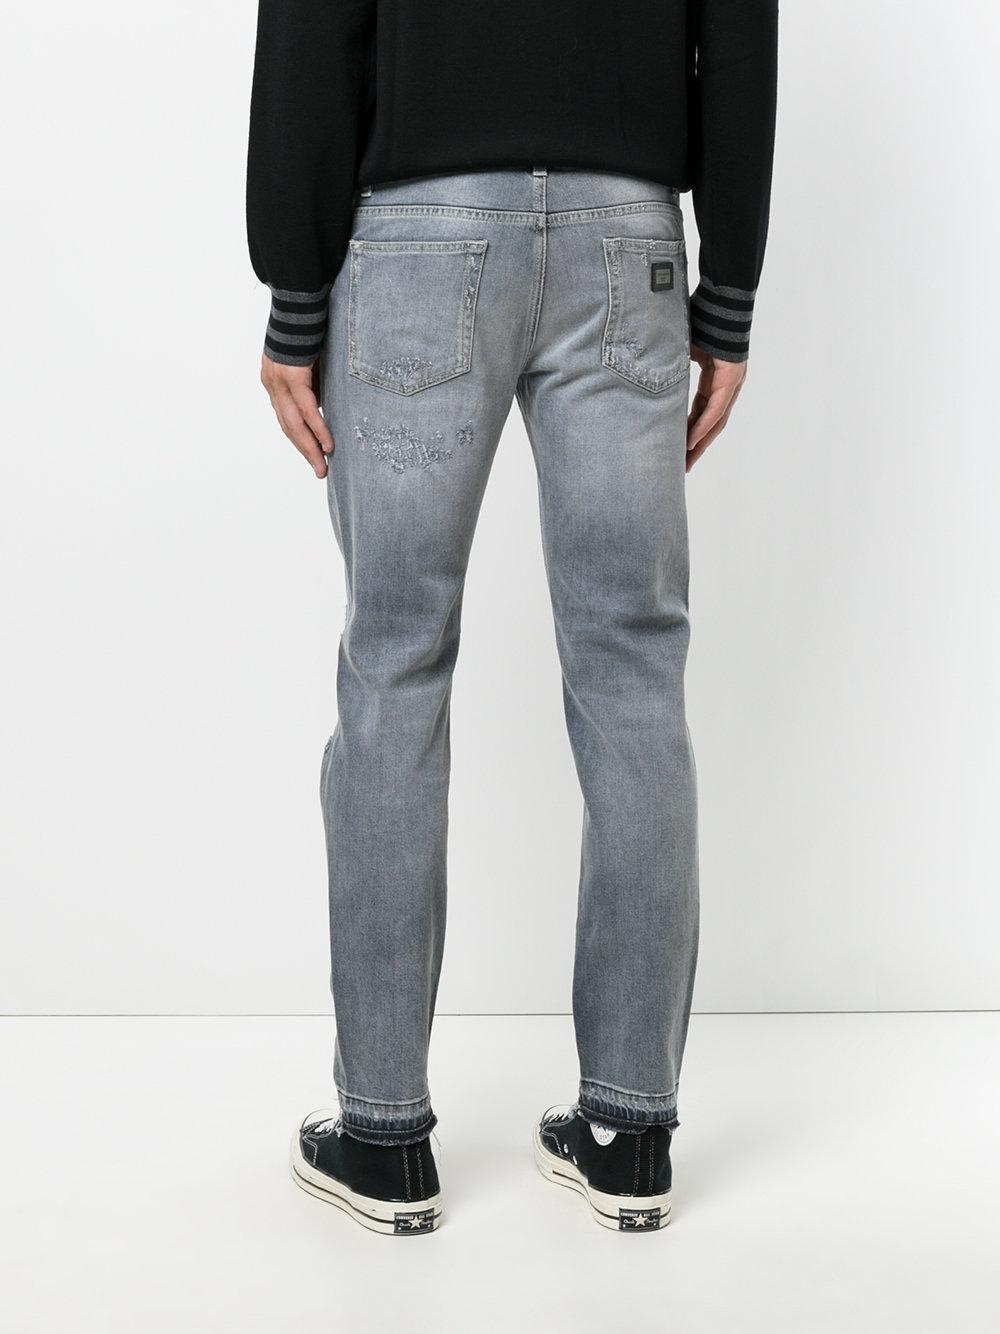 dolce gabbana ripped detail jeans in blue for men lyst. Black Bedroom Furniture Sets. Home Design Ideas